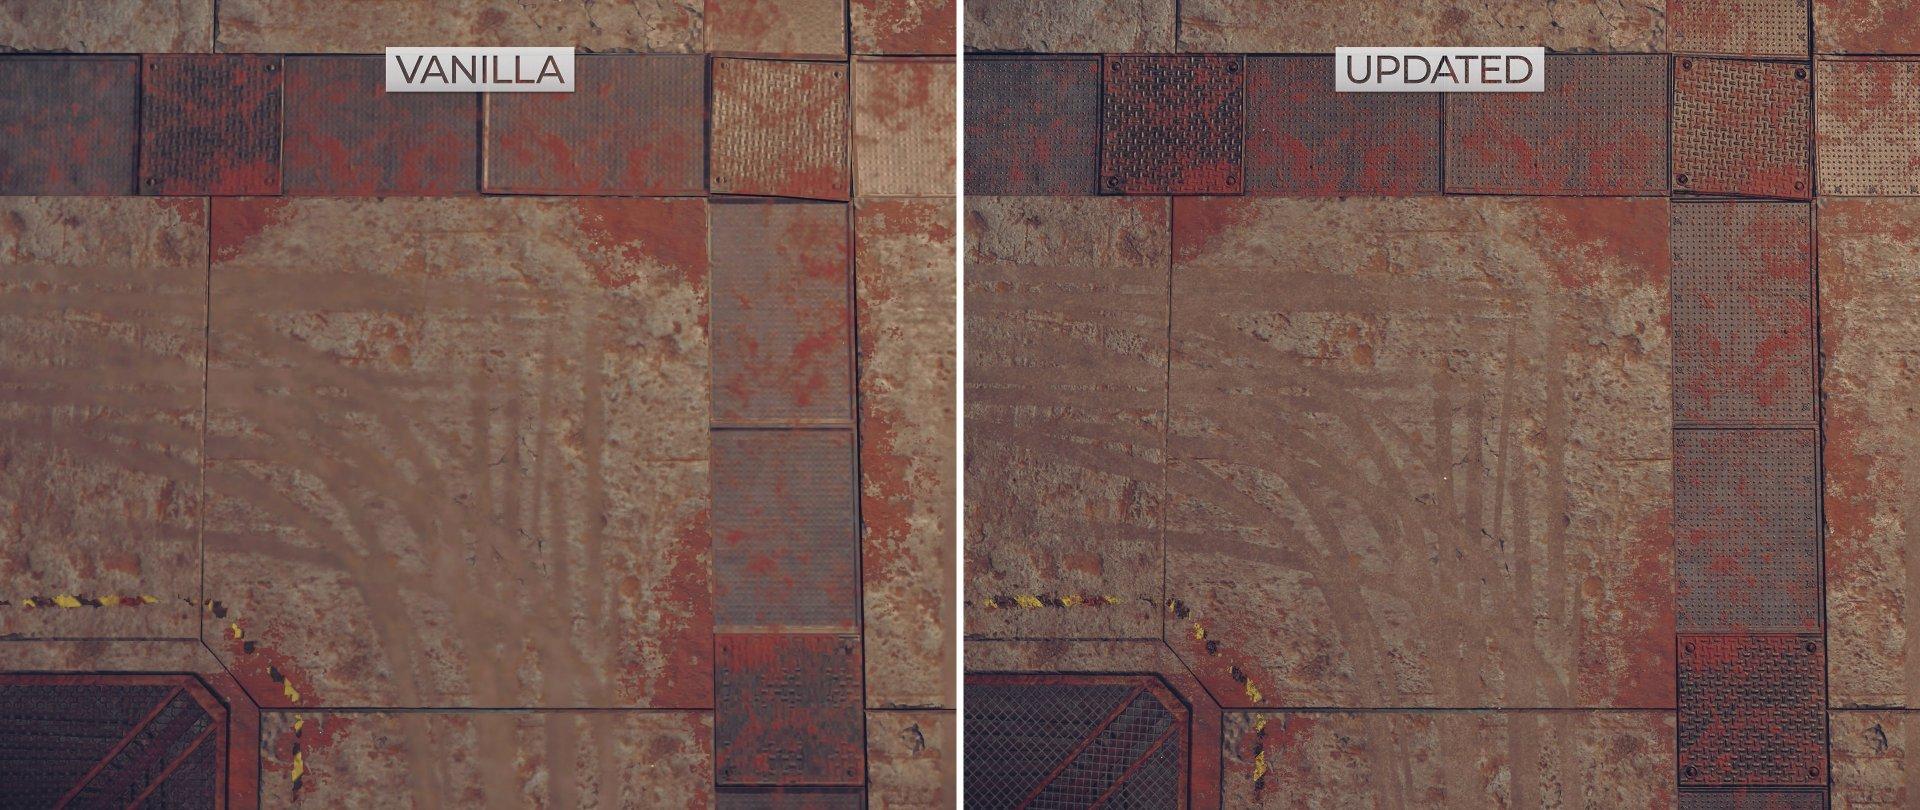 NieR Automata HD Texture Pack comparison screenshots-4